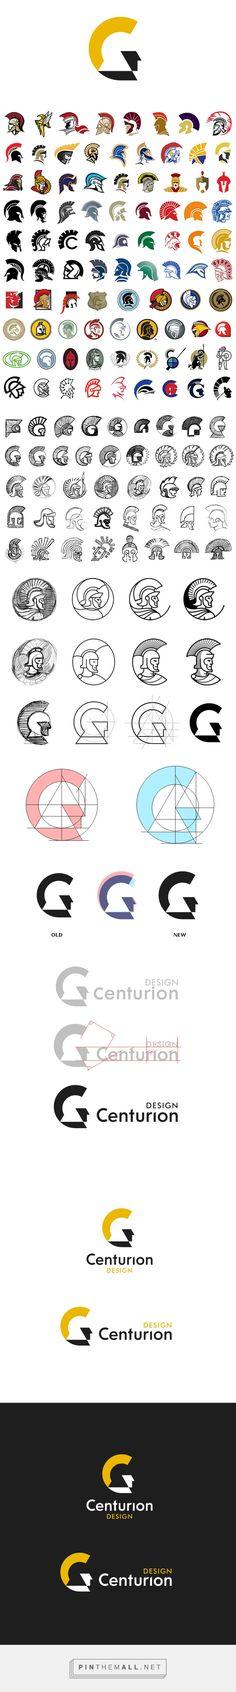 Case Study: Centurion Logo Design